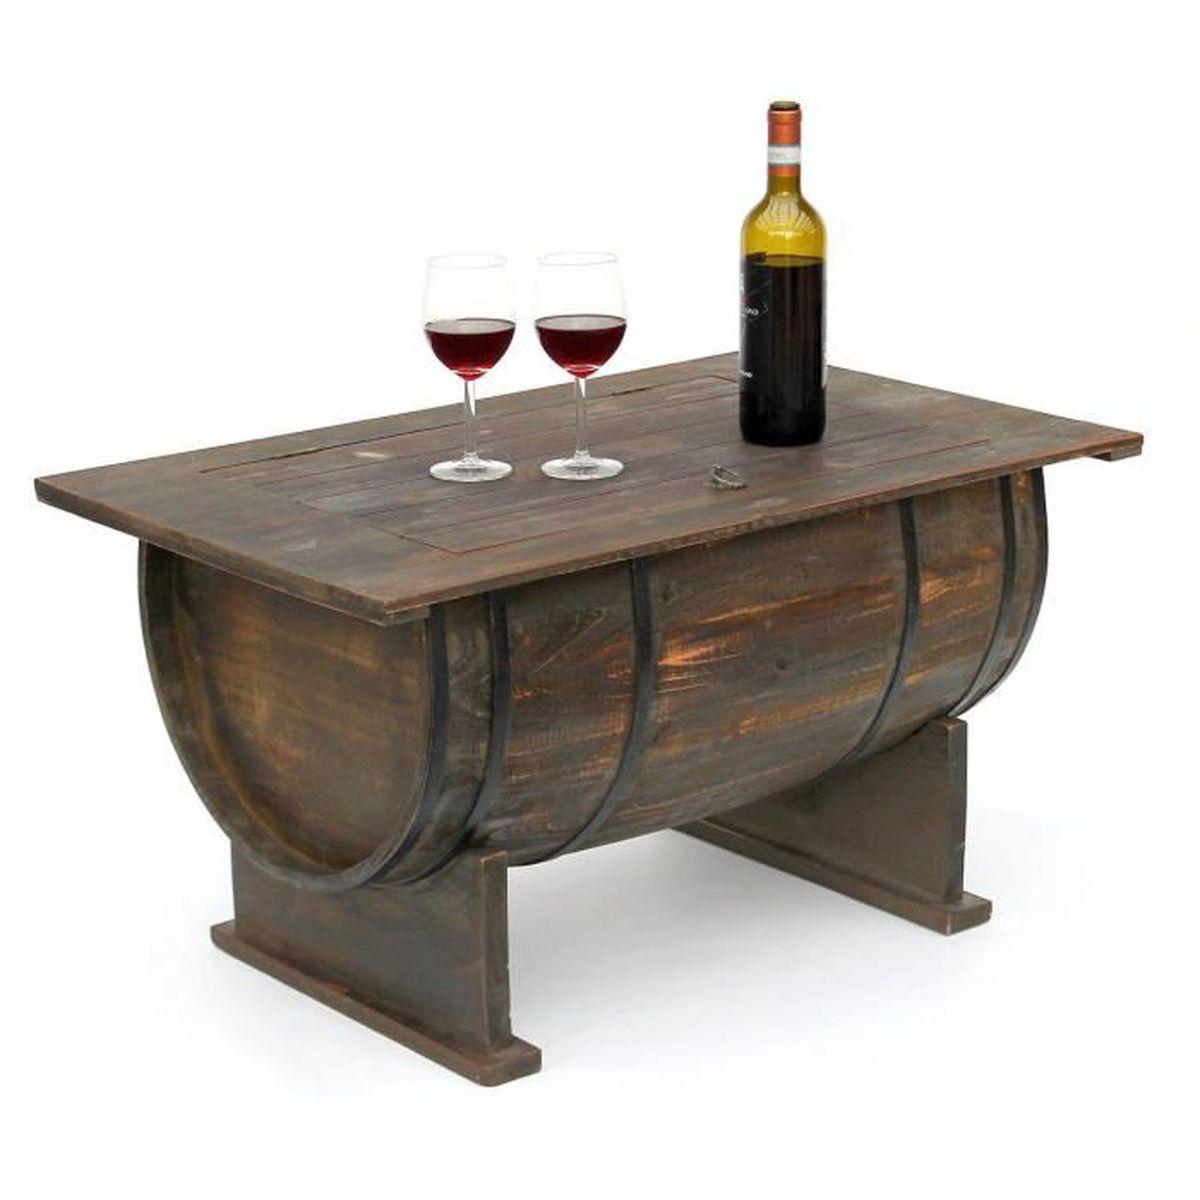 Meuble En Tonneau De Vin dandibo table de salon tonneau de vin 5084 table en bois etagère à vin 80  cm table d'appoint vin bar